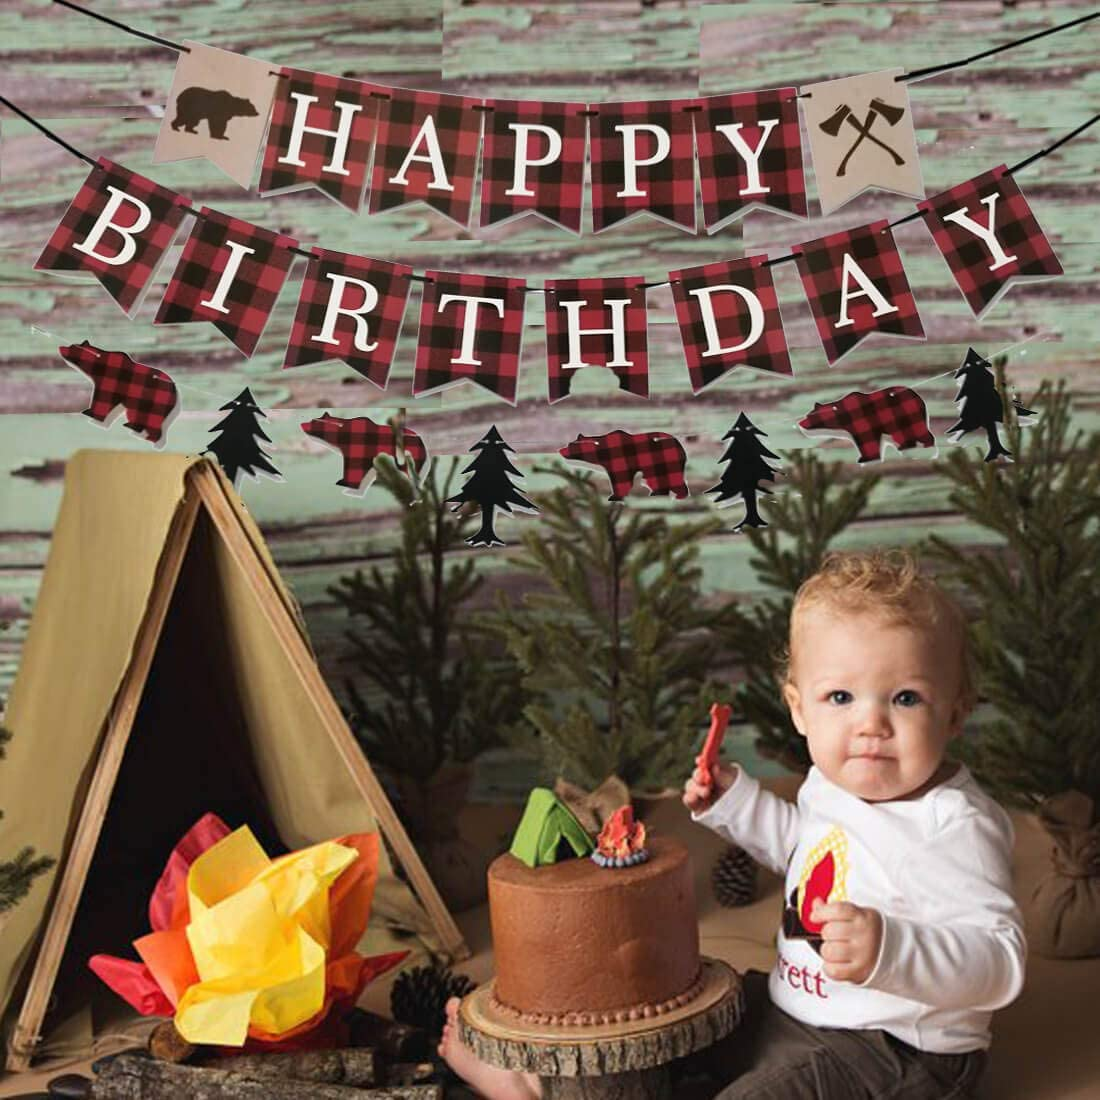 Camping Birthday Party Decorations,Happy Birthday /& Woodland Bear Banner Buffalo Plaid maxfor Lumberjack Birthday Party Banner,Lumberjack 1st